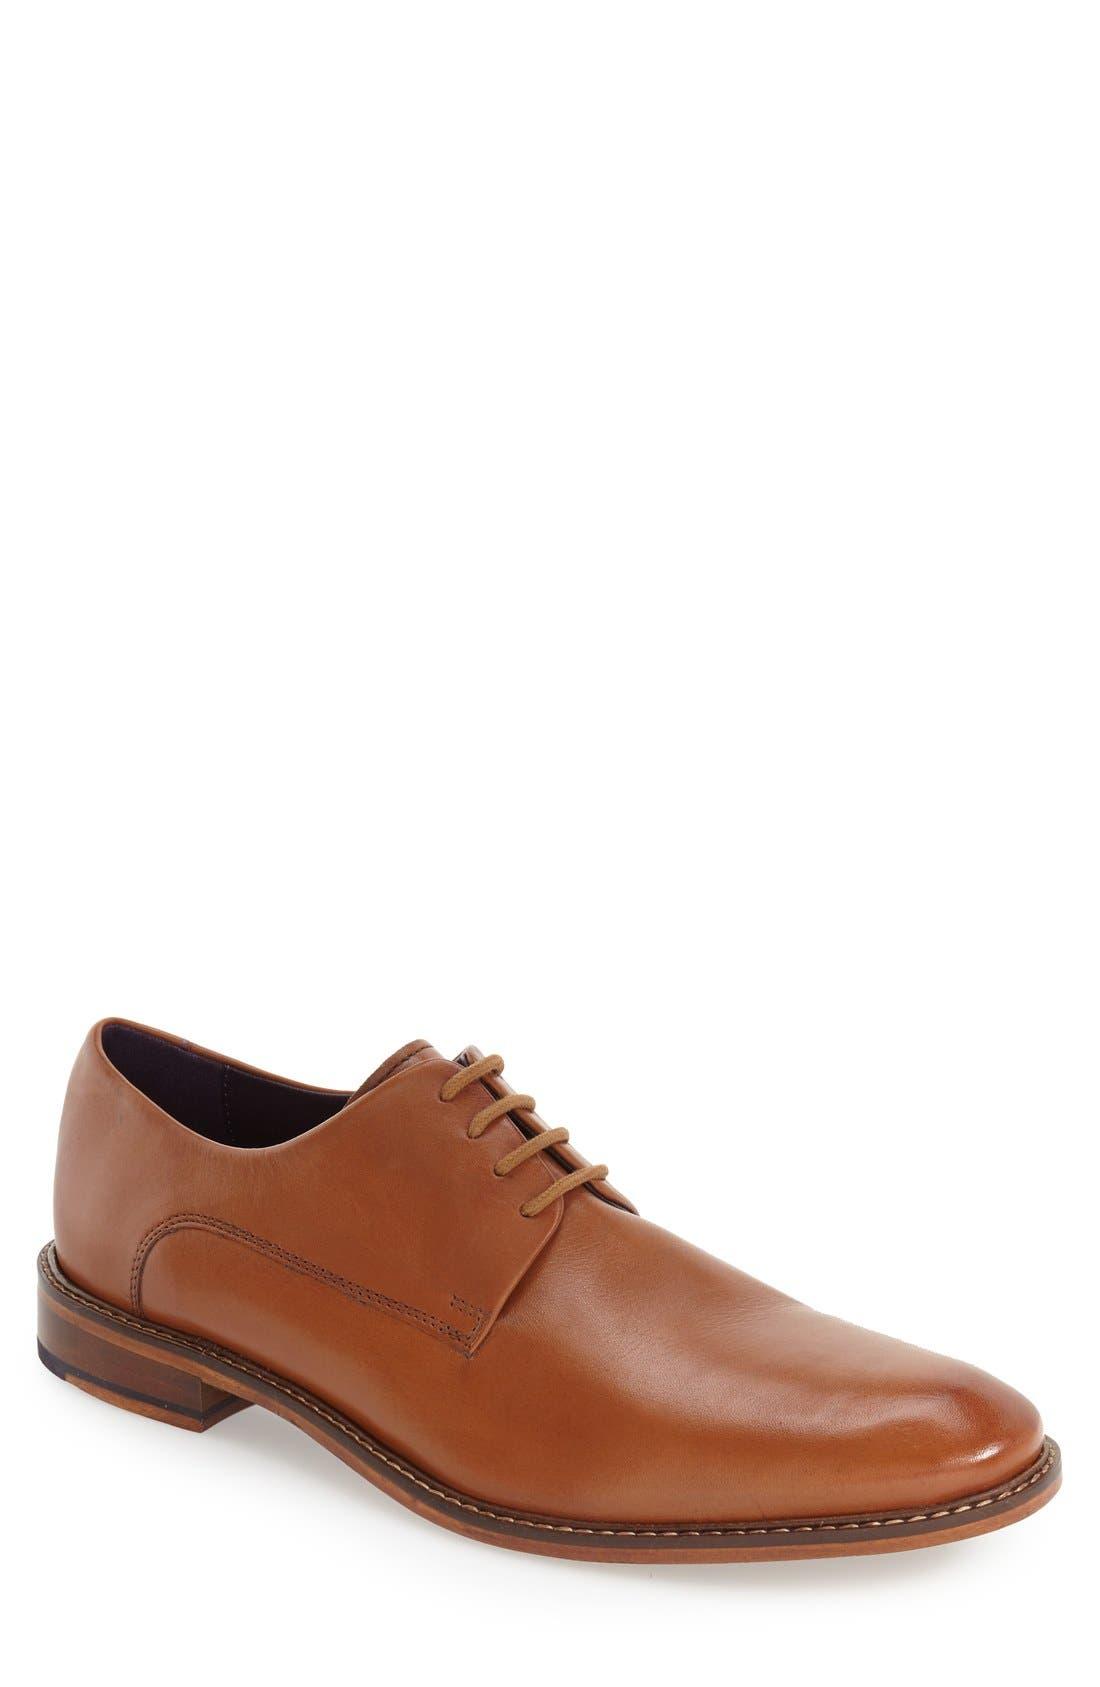 'Irron 3' Plain Toe Derby,                         Main,                         color, Tan